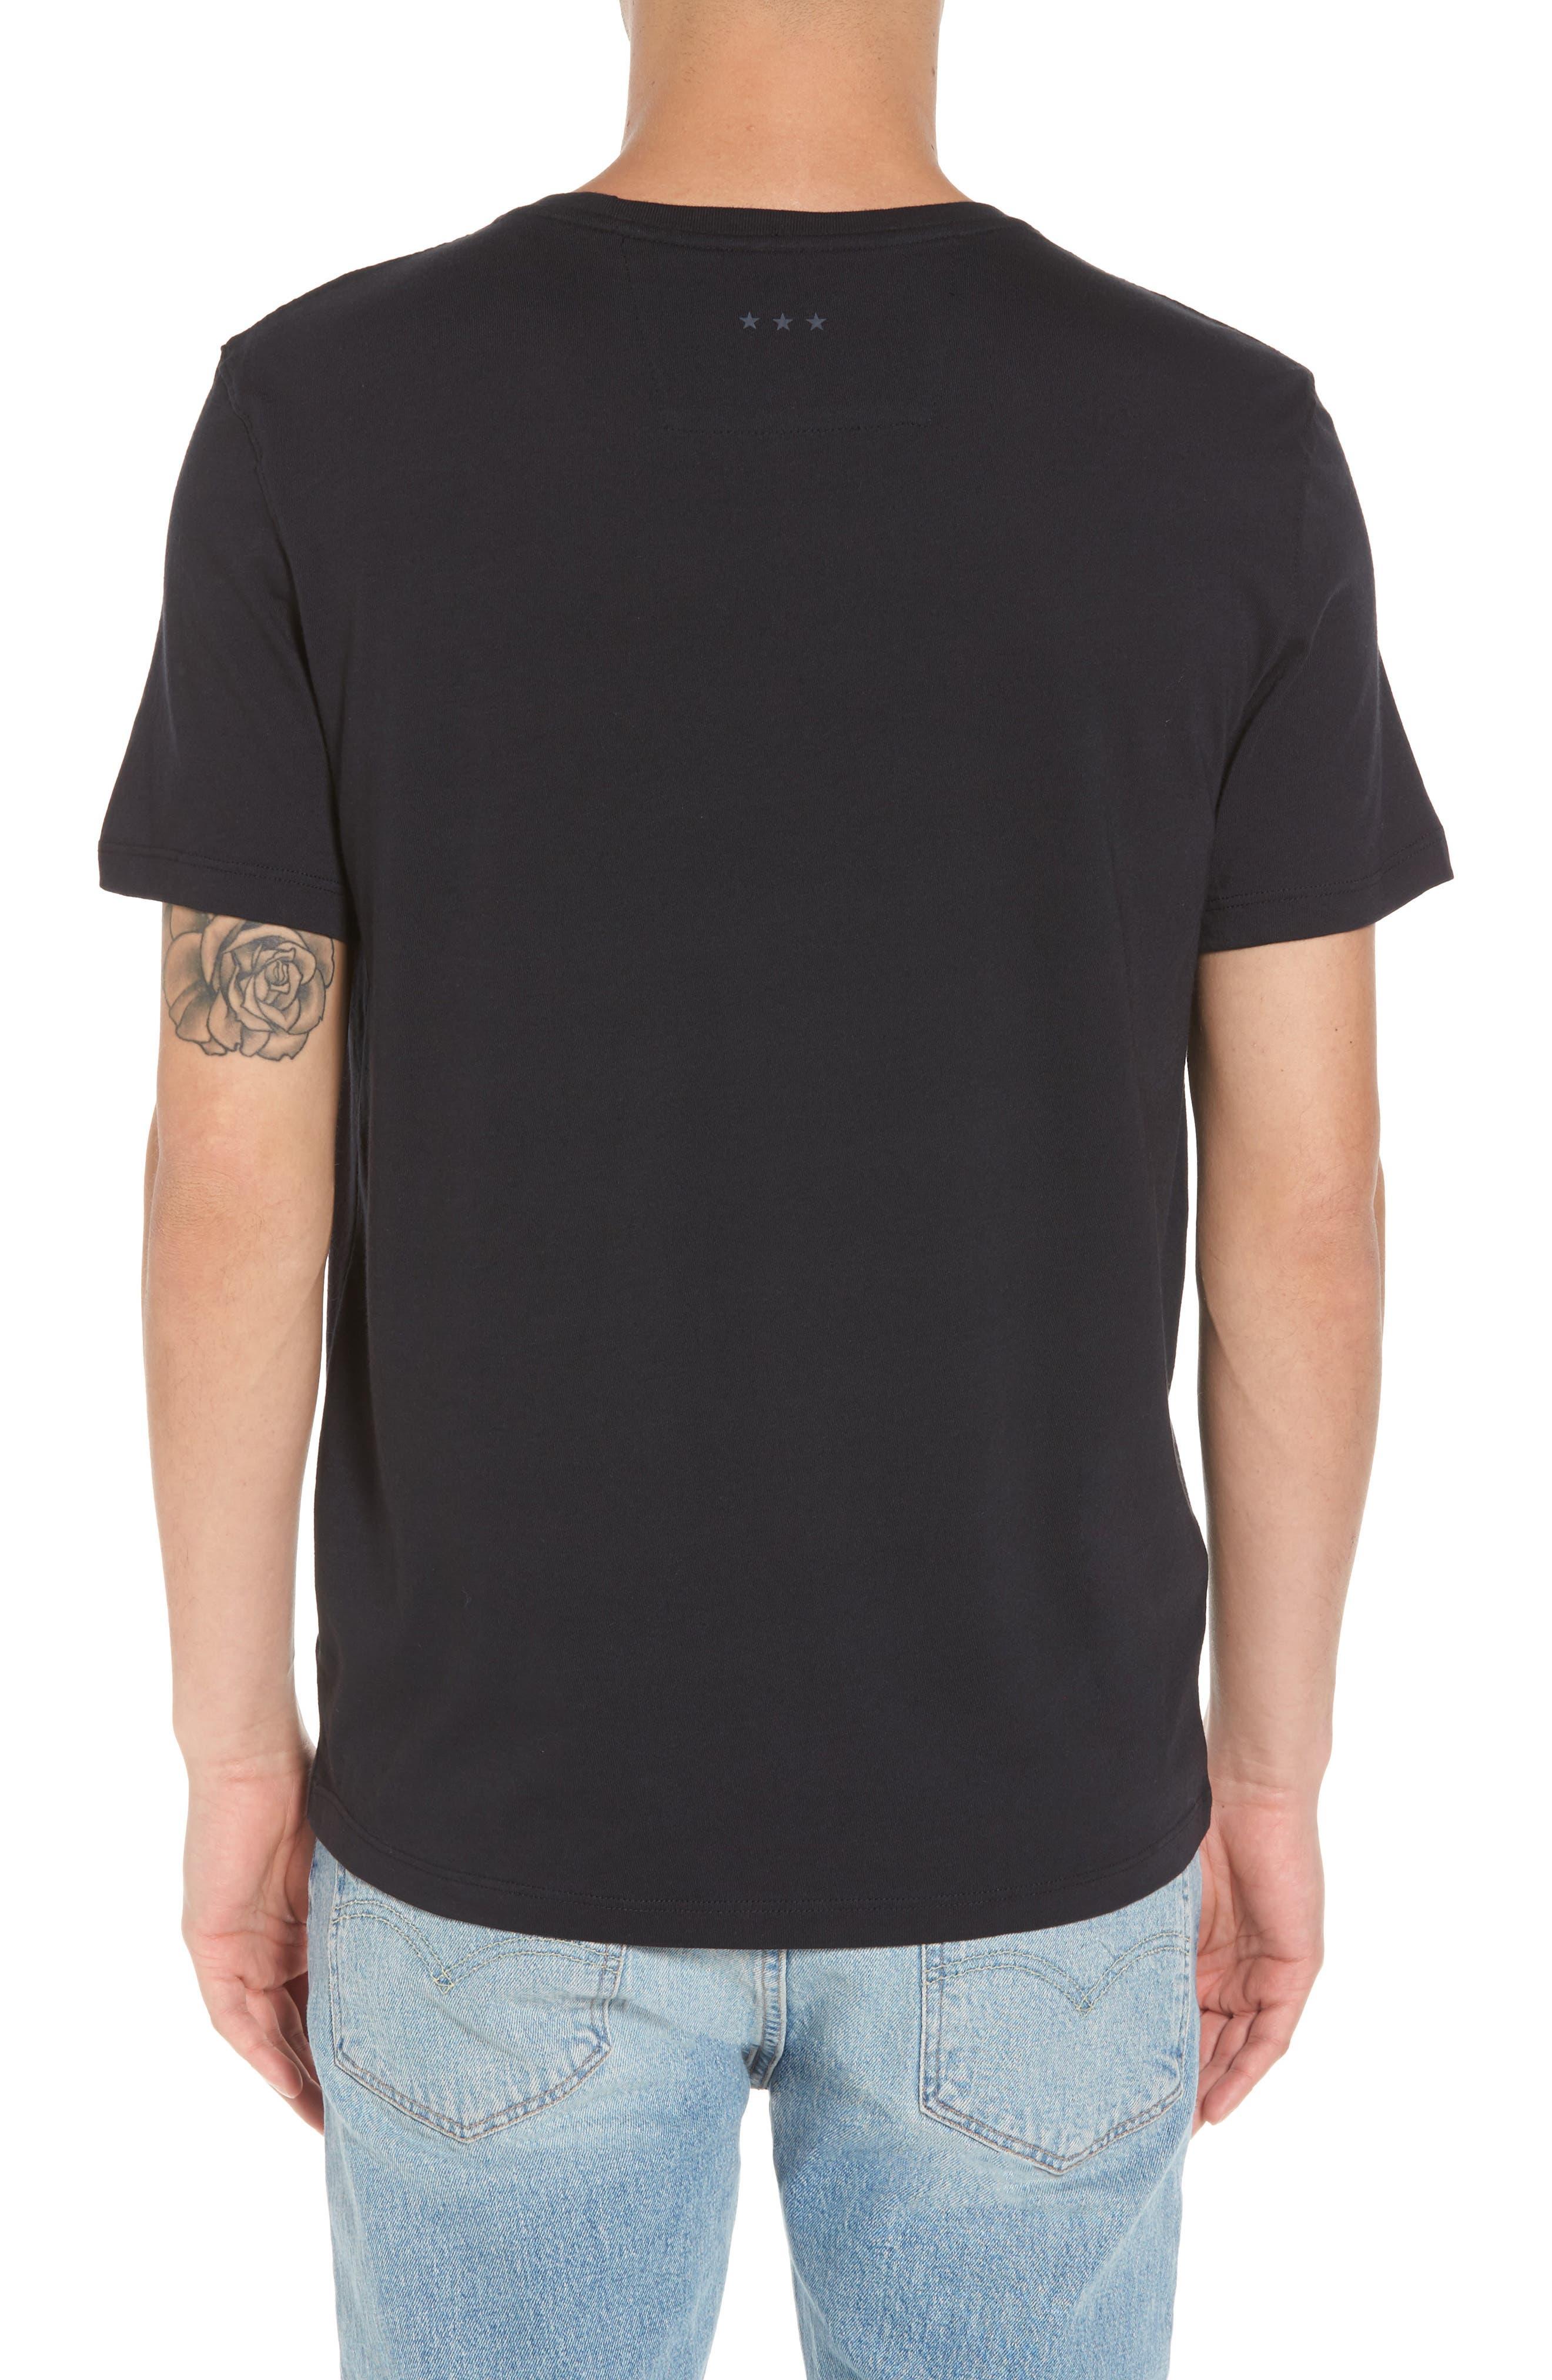 Guns N Roses Graphic T-Shirt,                             Alternate thumbnail 2, color,                             001